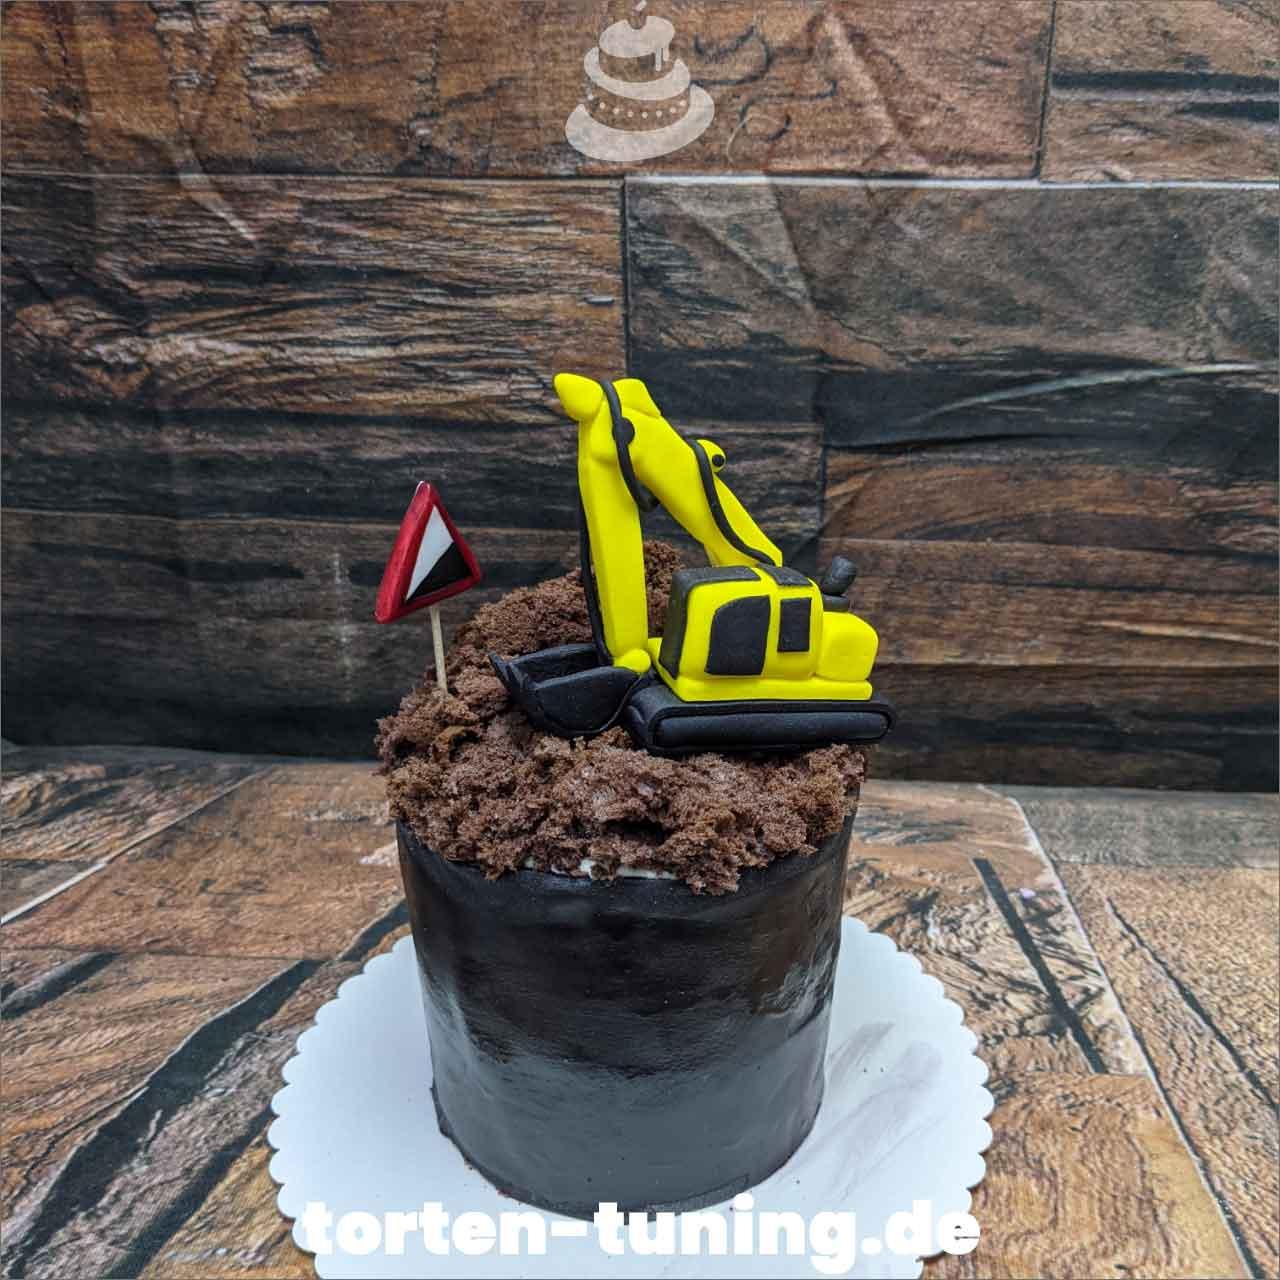 Bagger Dripcake Obsttorte Geburtstagstorte Motivtorte Torte Tortendekoration Torte online bestellen Suhl Thüringen Torten Tuning Sahnetorte Tortenfiguren Cake Topper